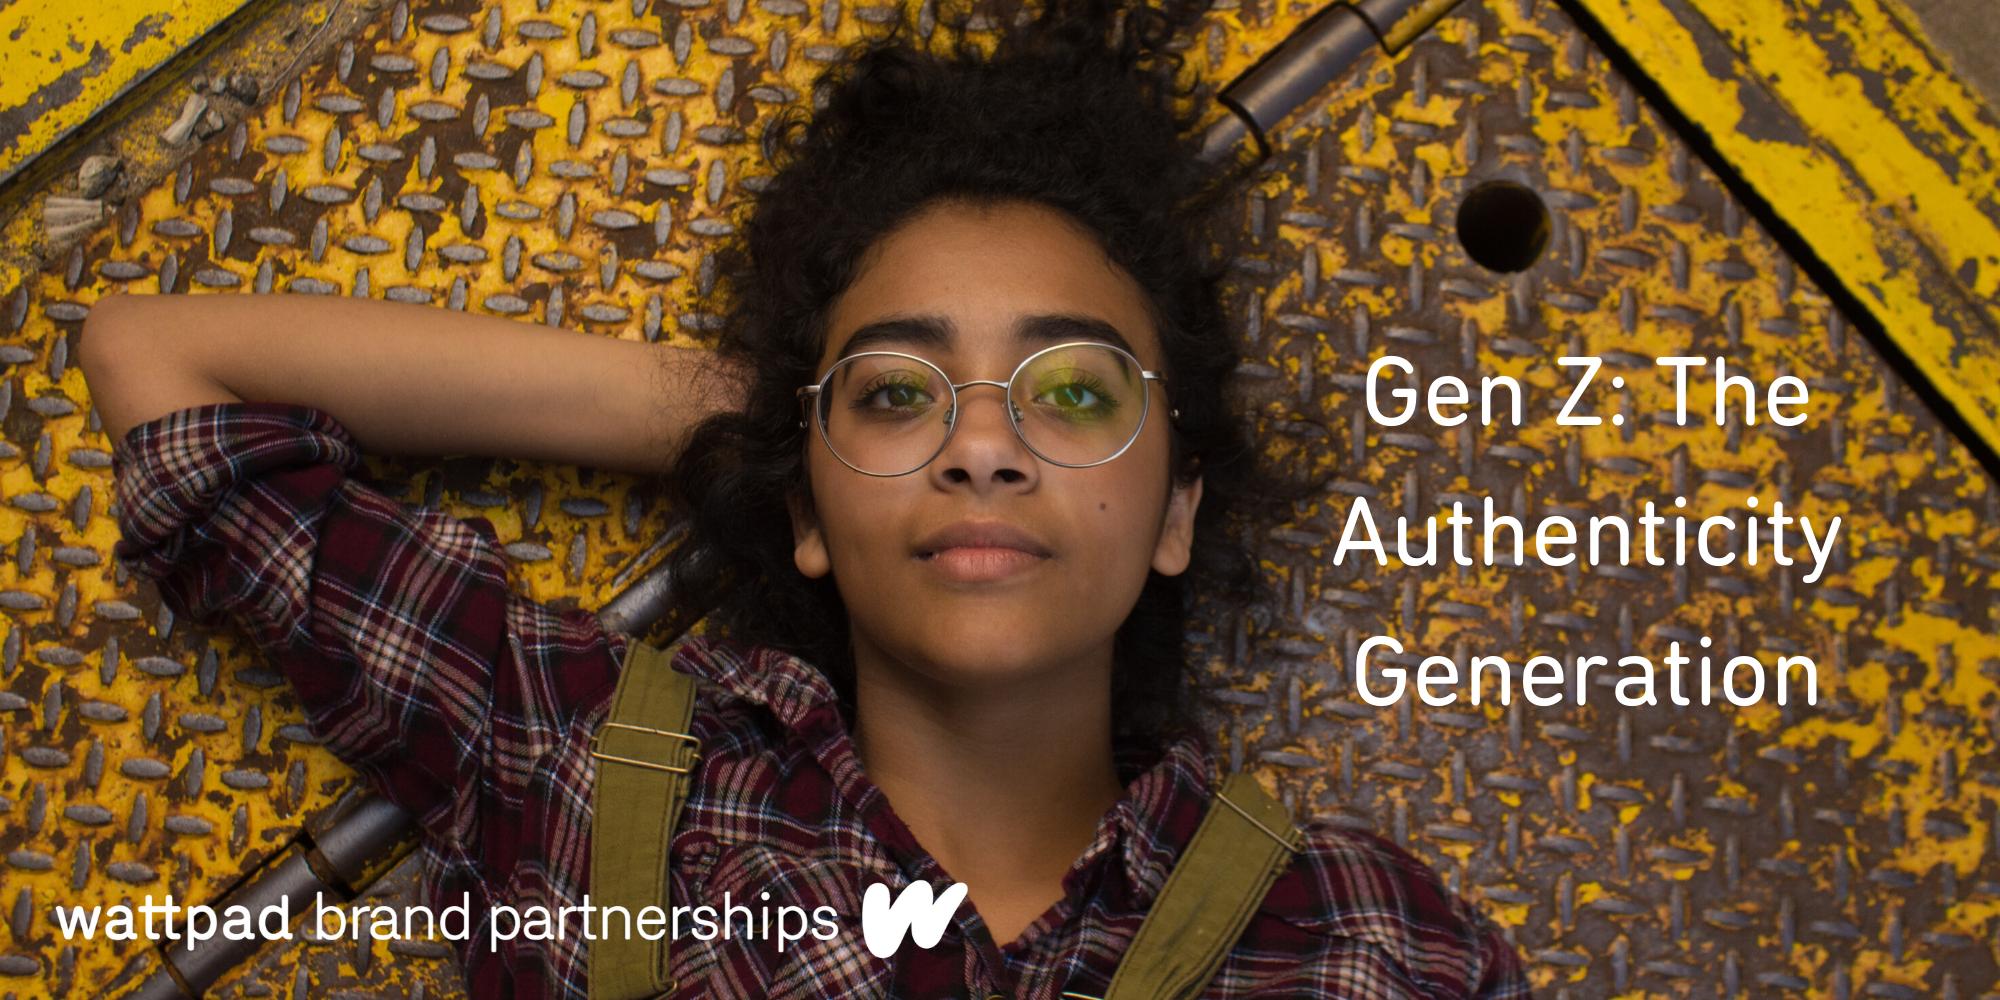 Gen Z: The Authenticity Generation